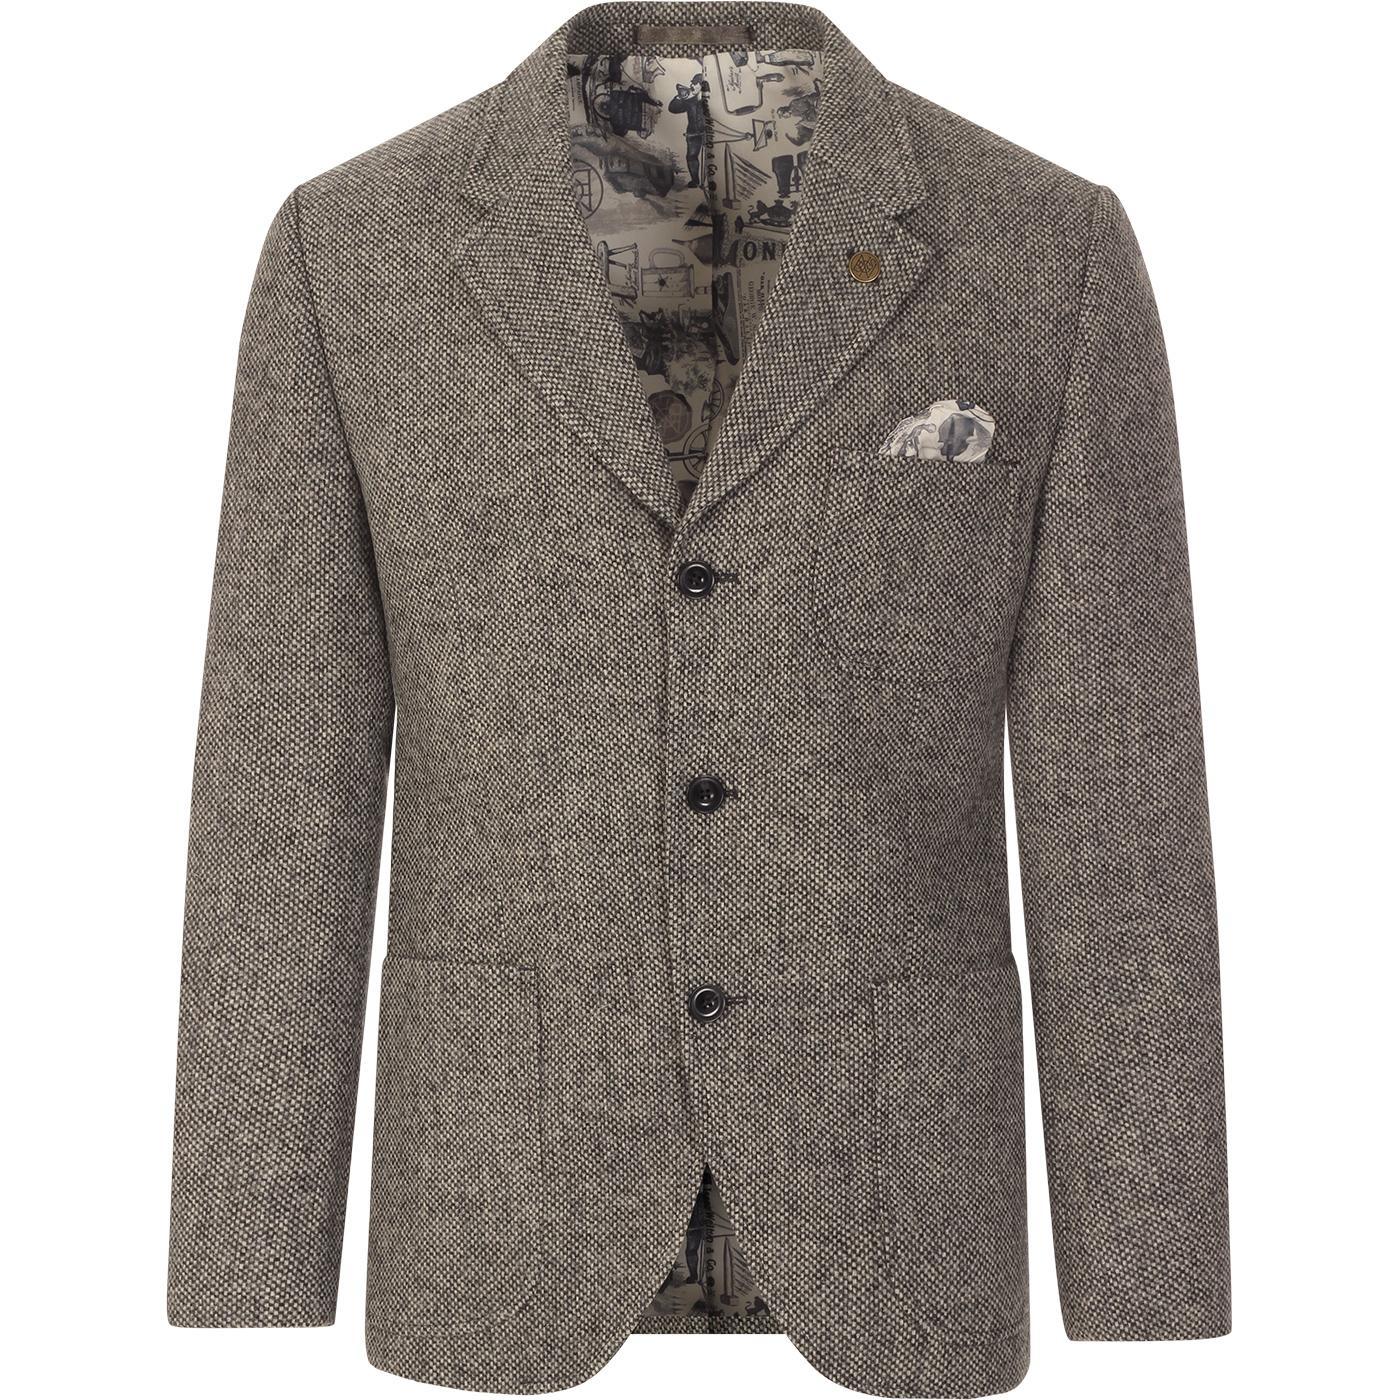 GIBSON LONDON Grey Shetland Birdseye Blazer Jacket